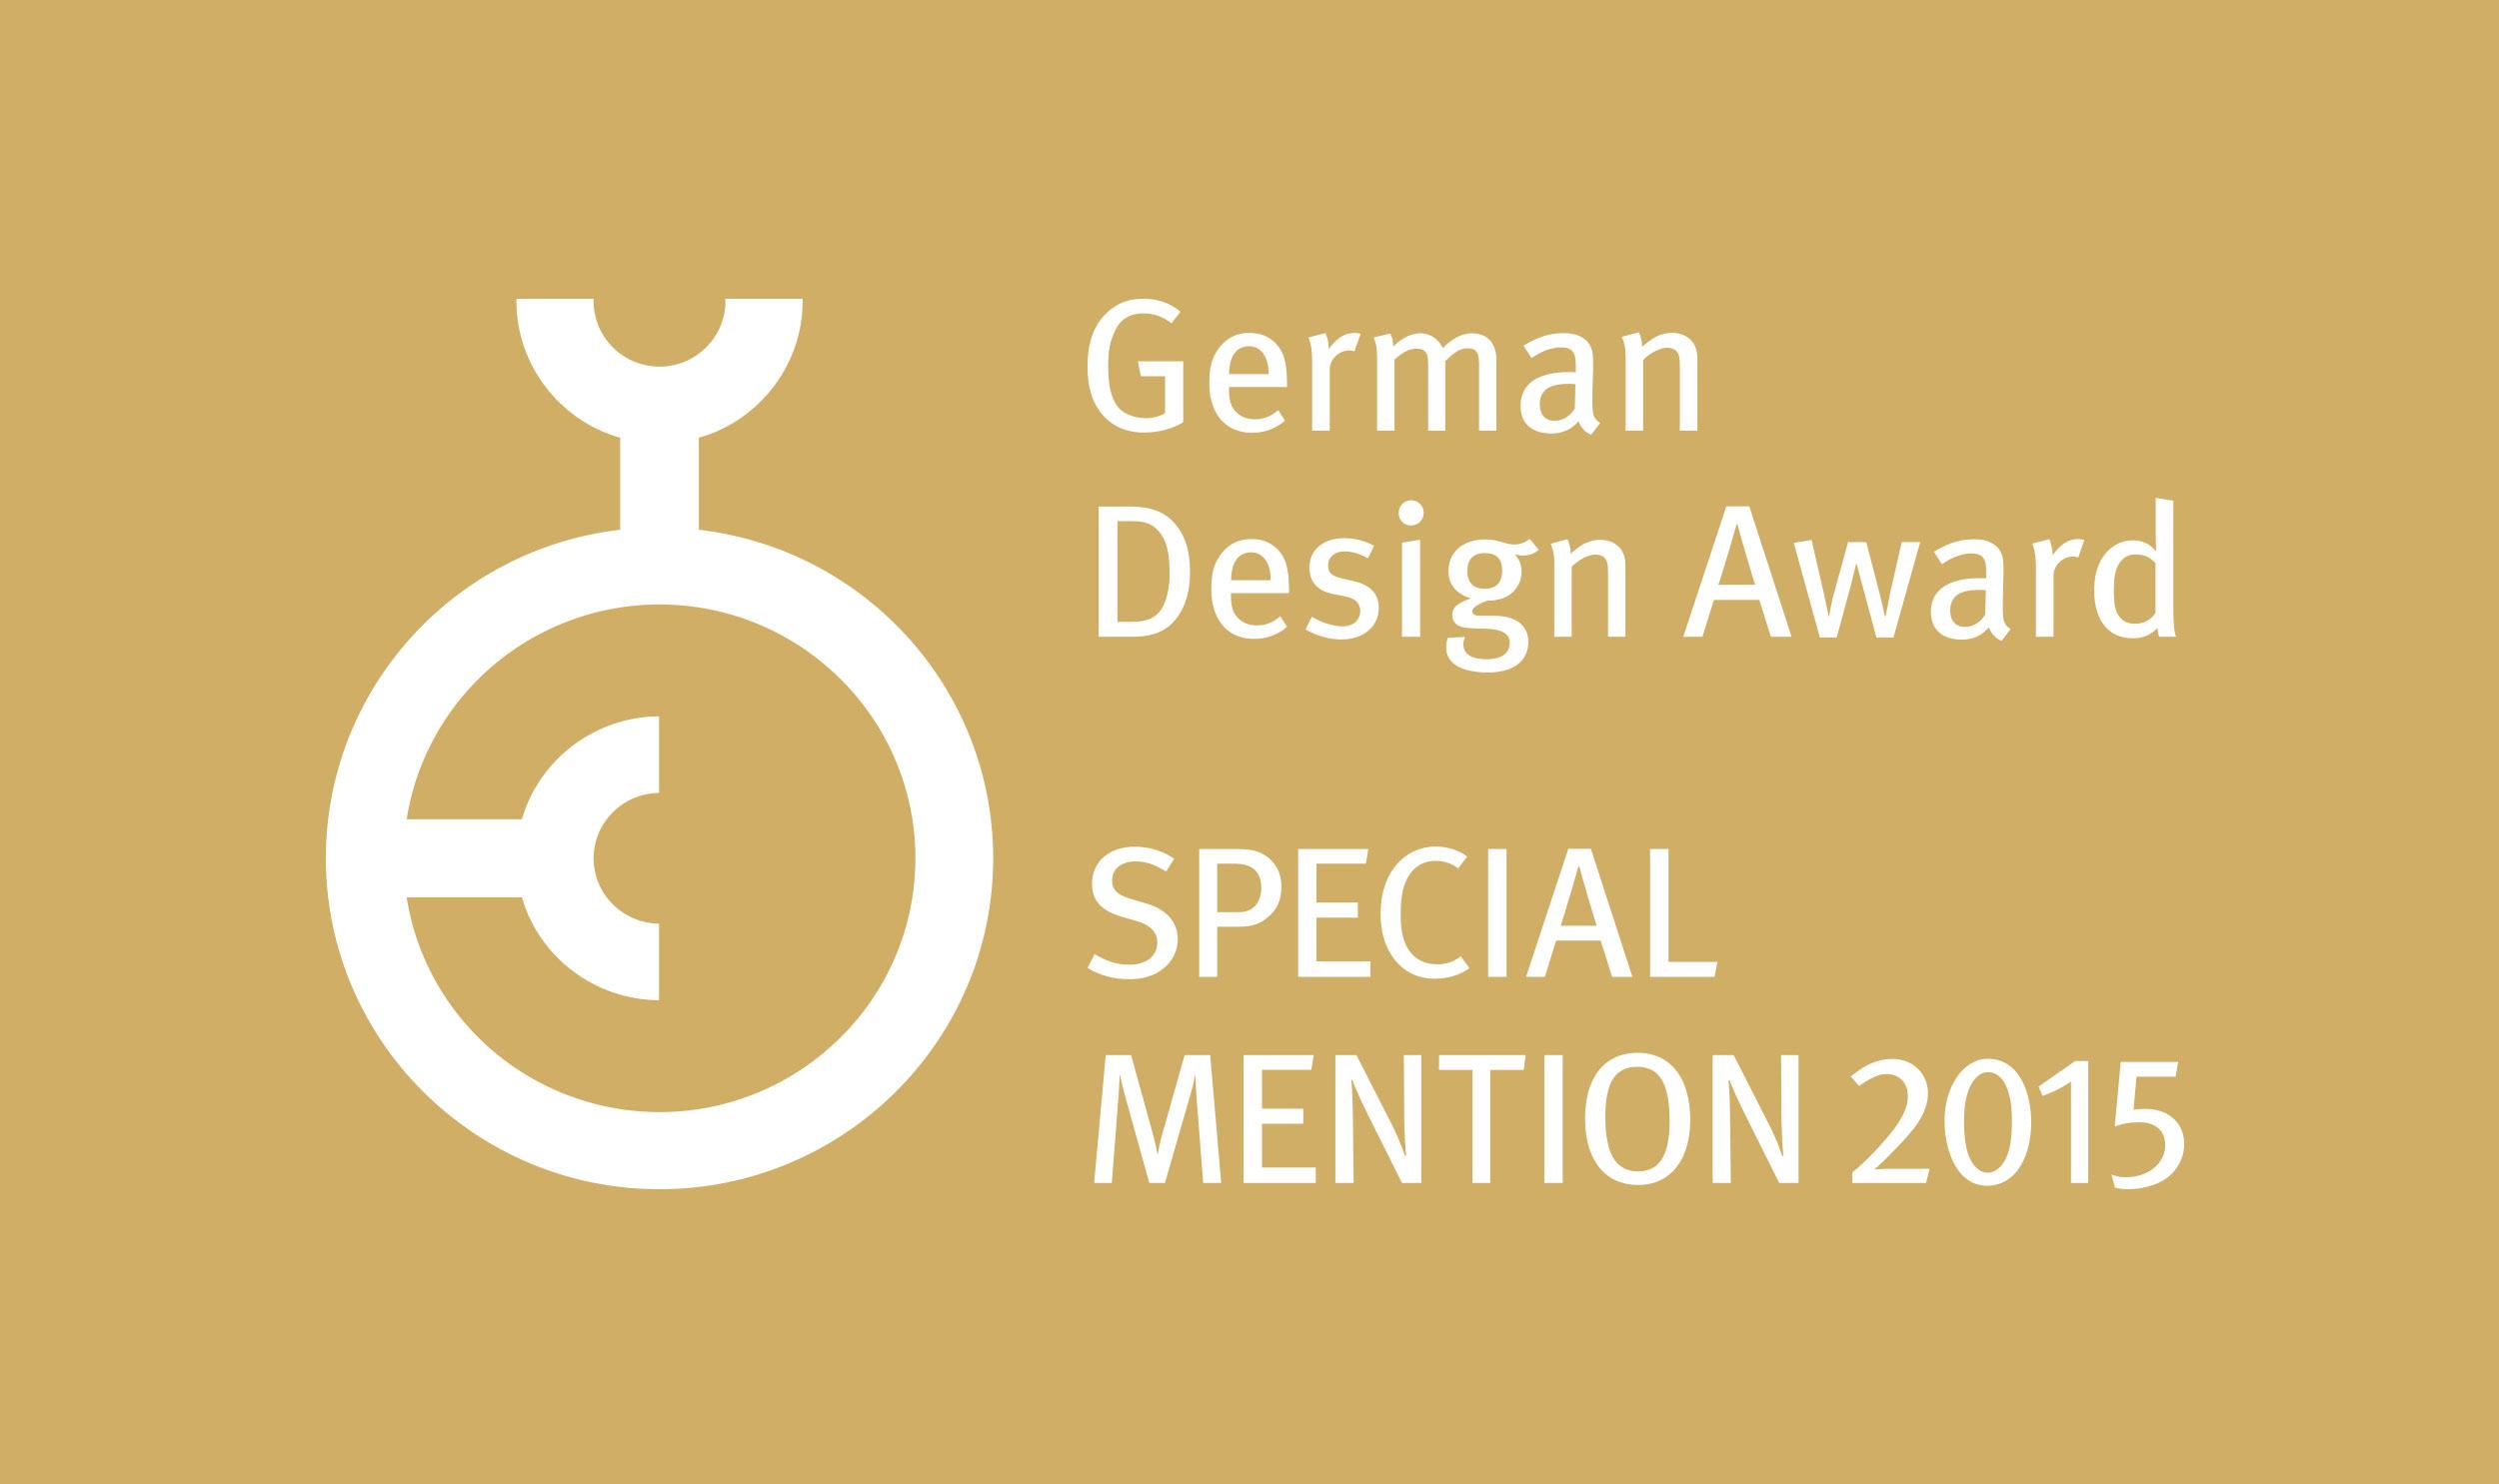 AWARD_German-Design-Award_2015_Special_Mention